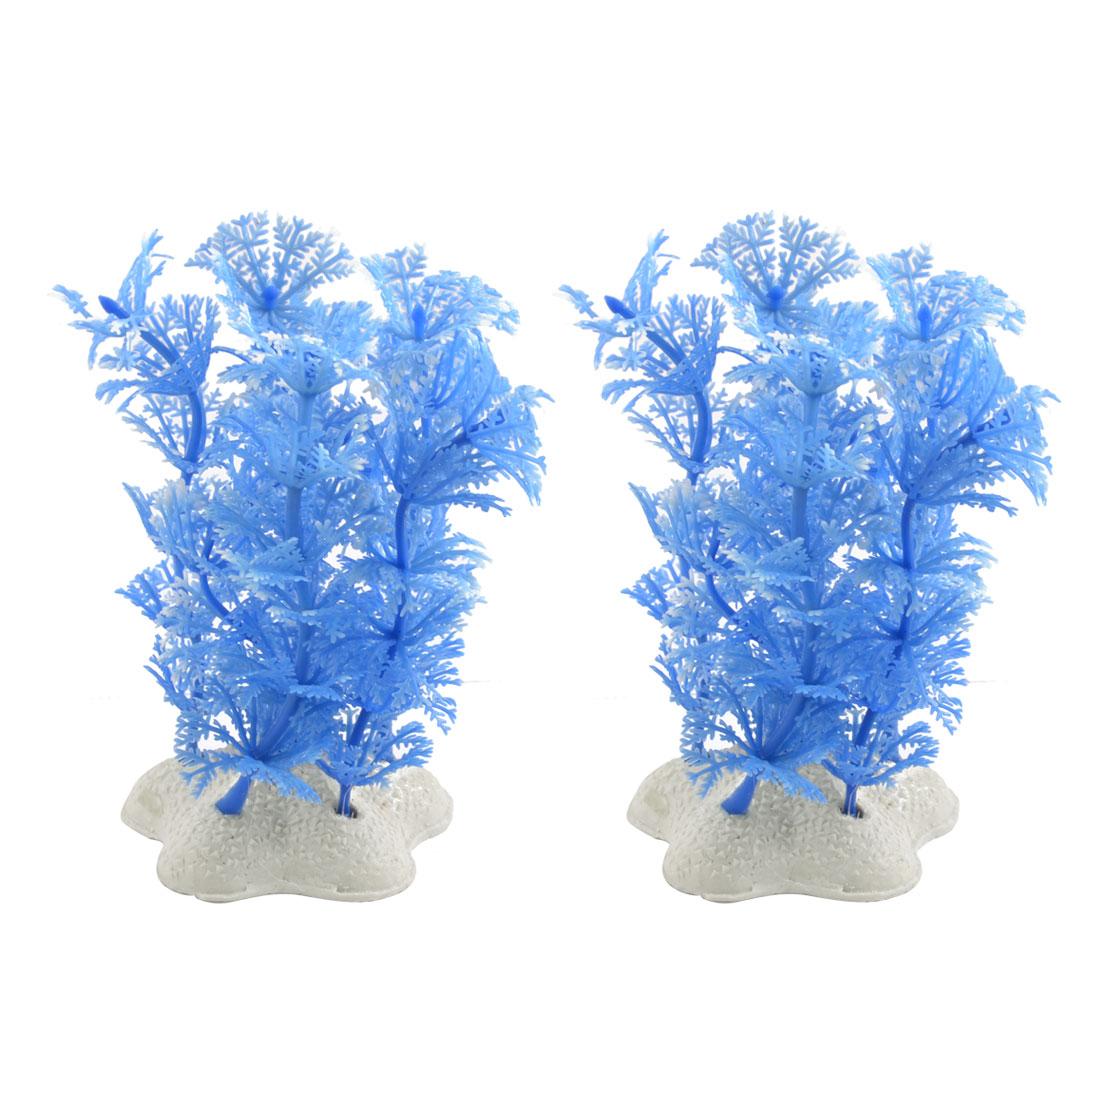 "2 Pcs 3.9"" Underwater Blue Plastic Plants Ornament for Aquarium Fish Tank"